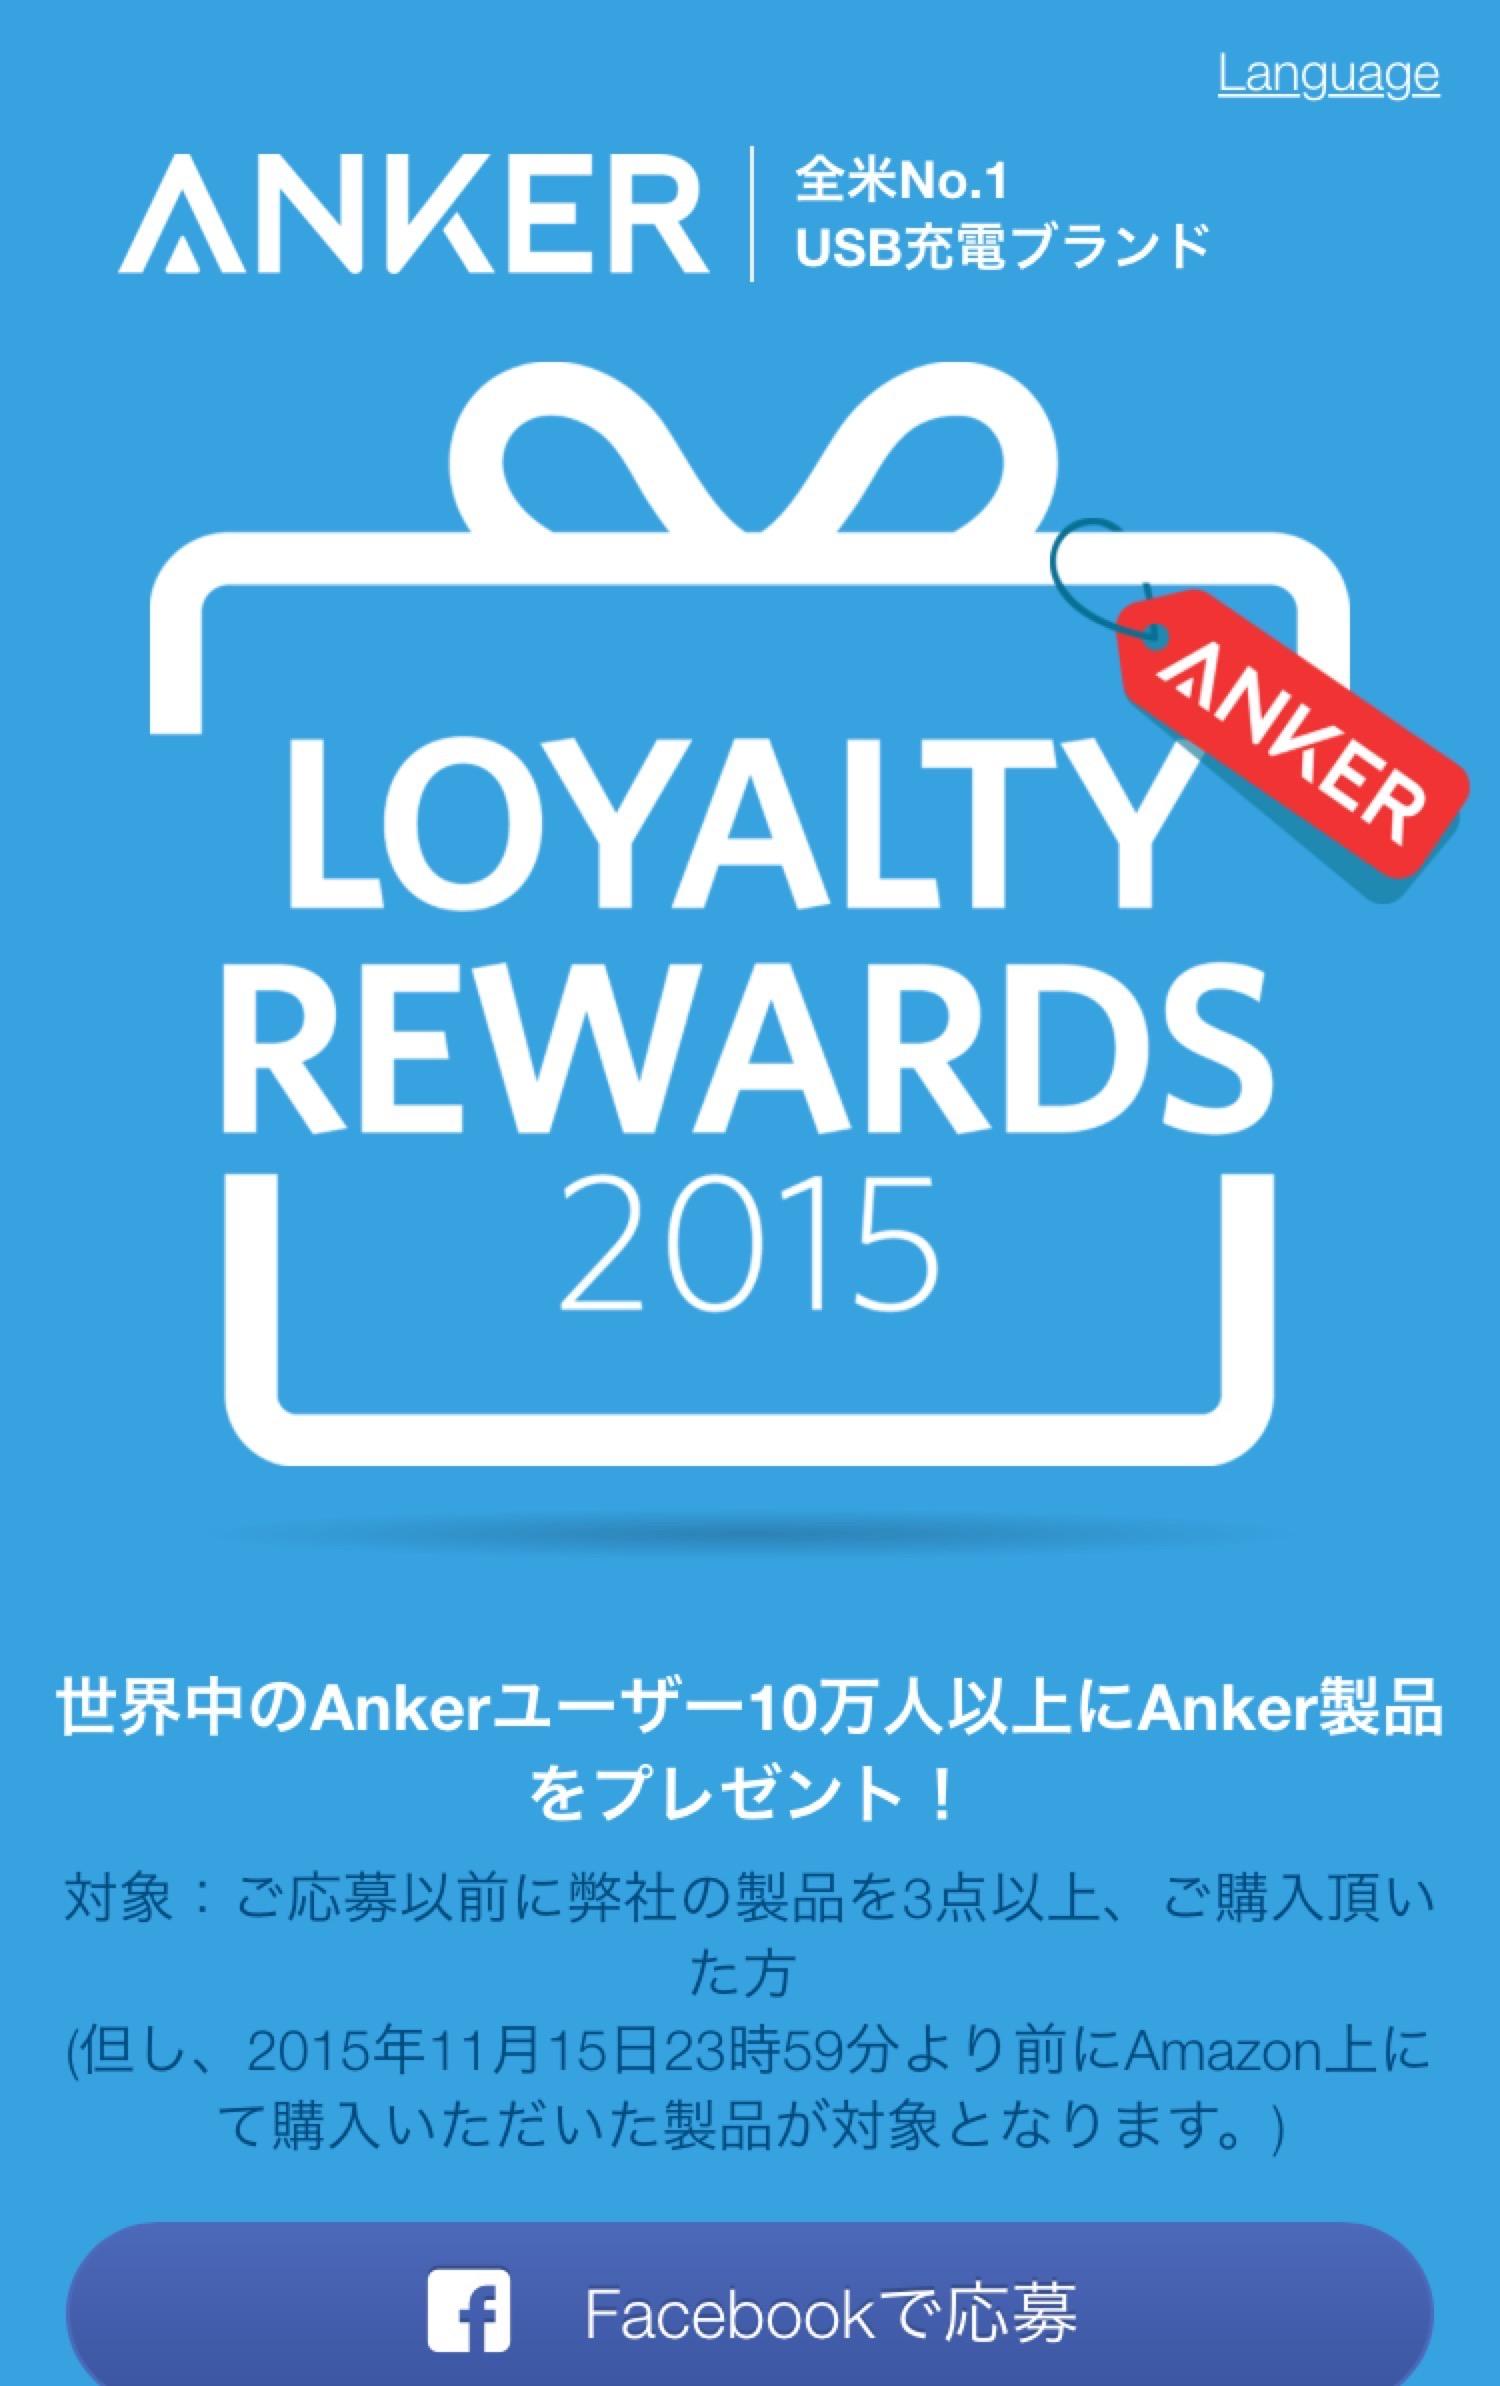 Anker reward20151